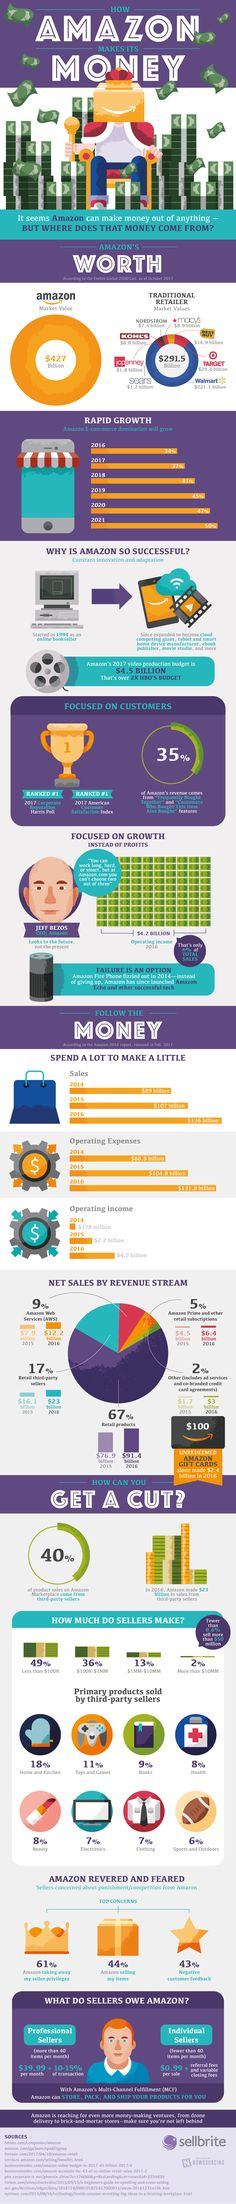 Breaking Down How Amazon Makes Money